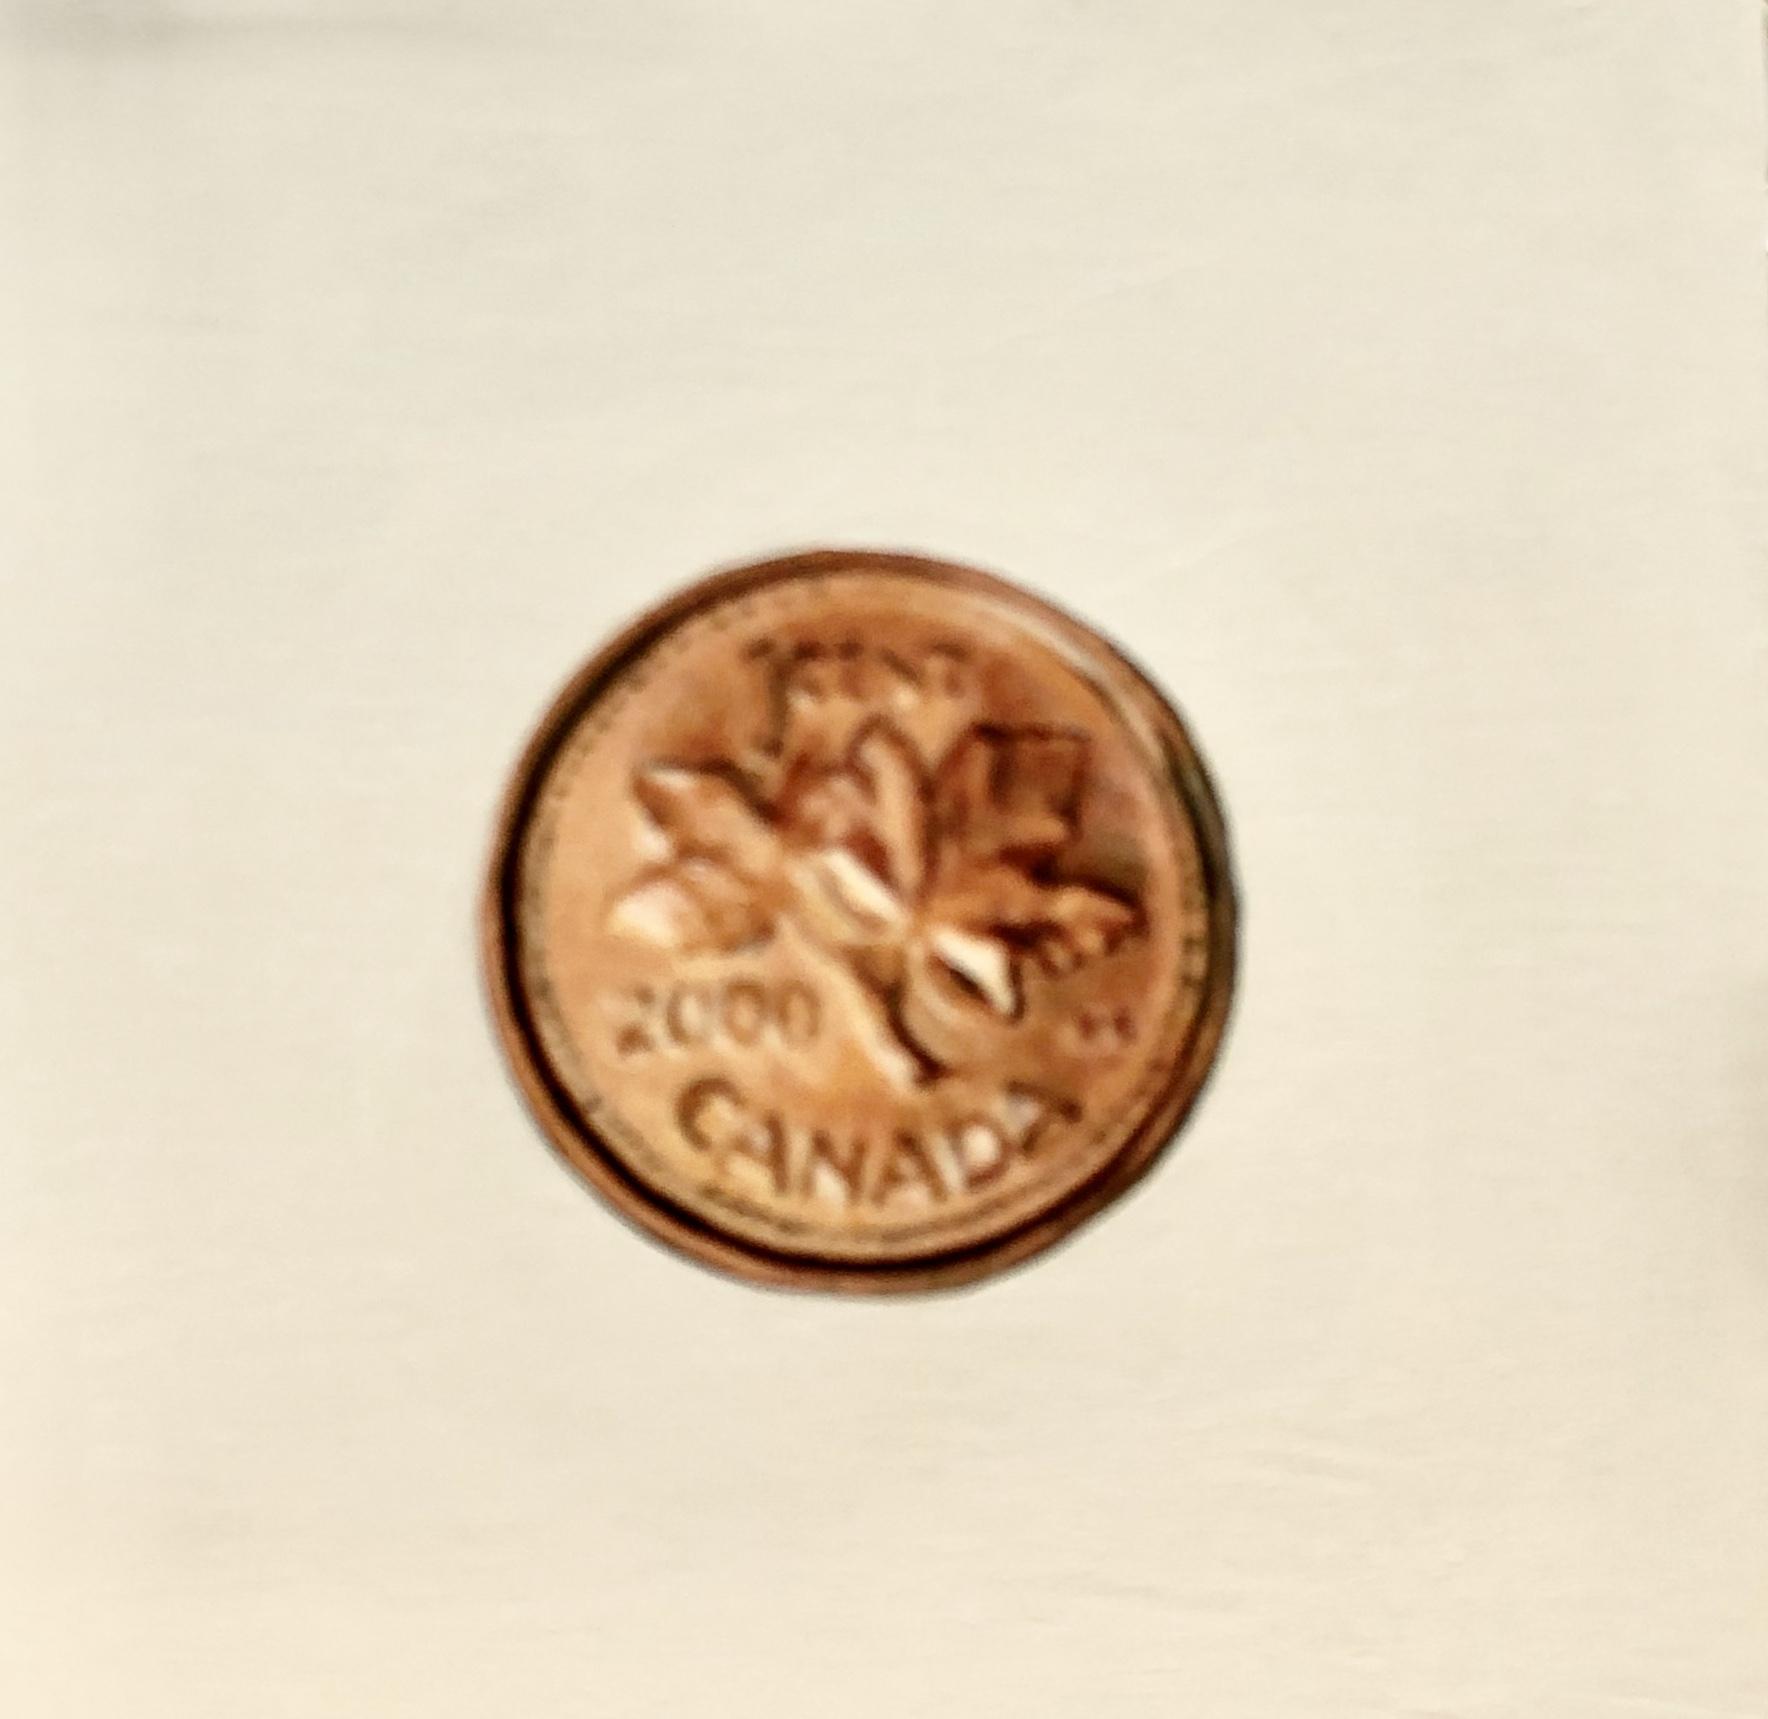 Penny 2000 by EM Vincent